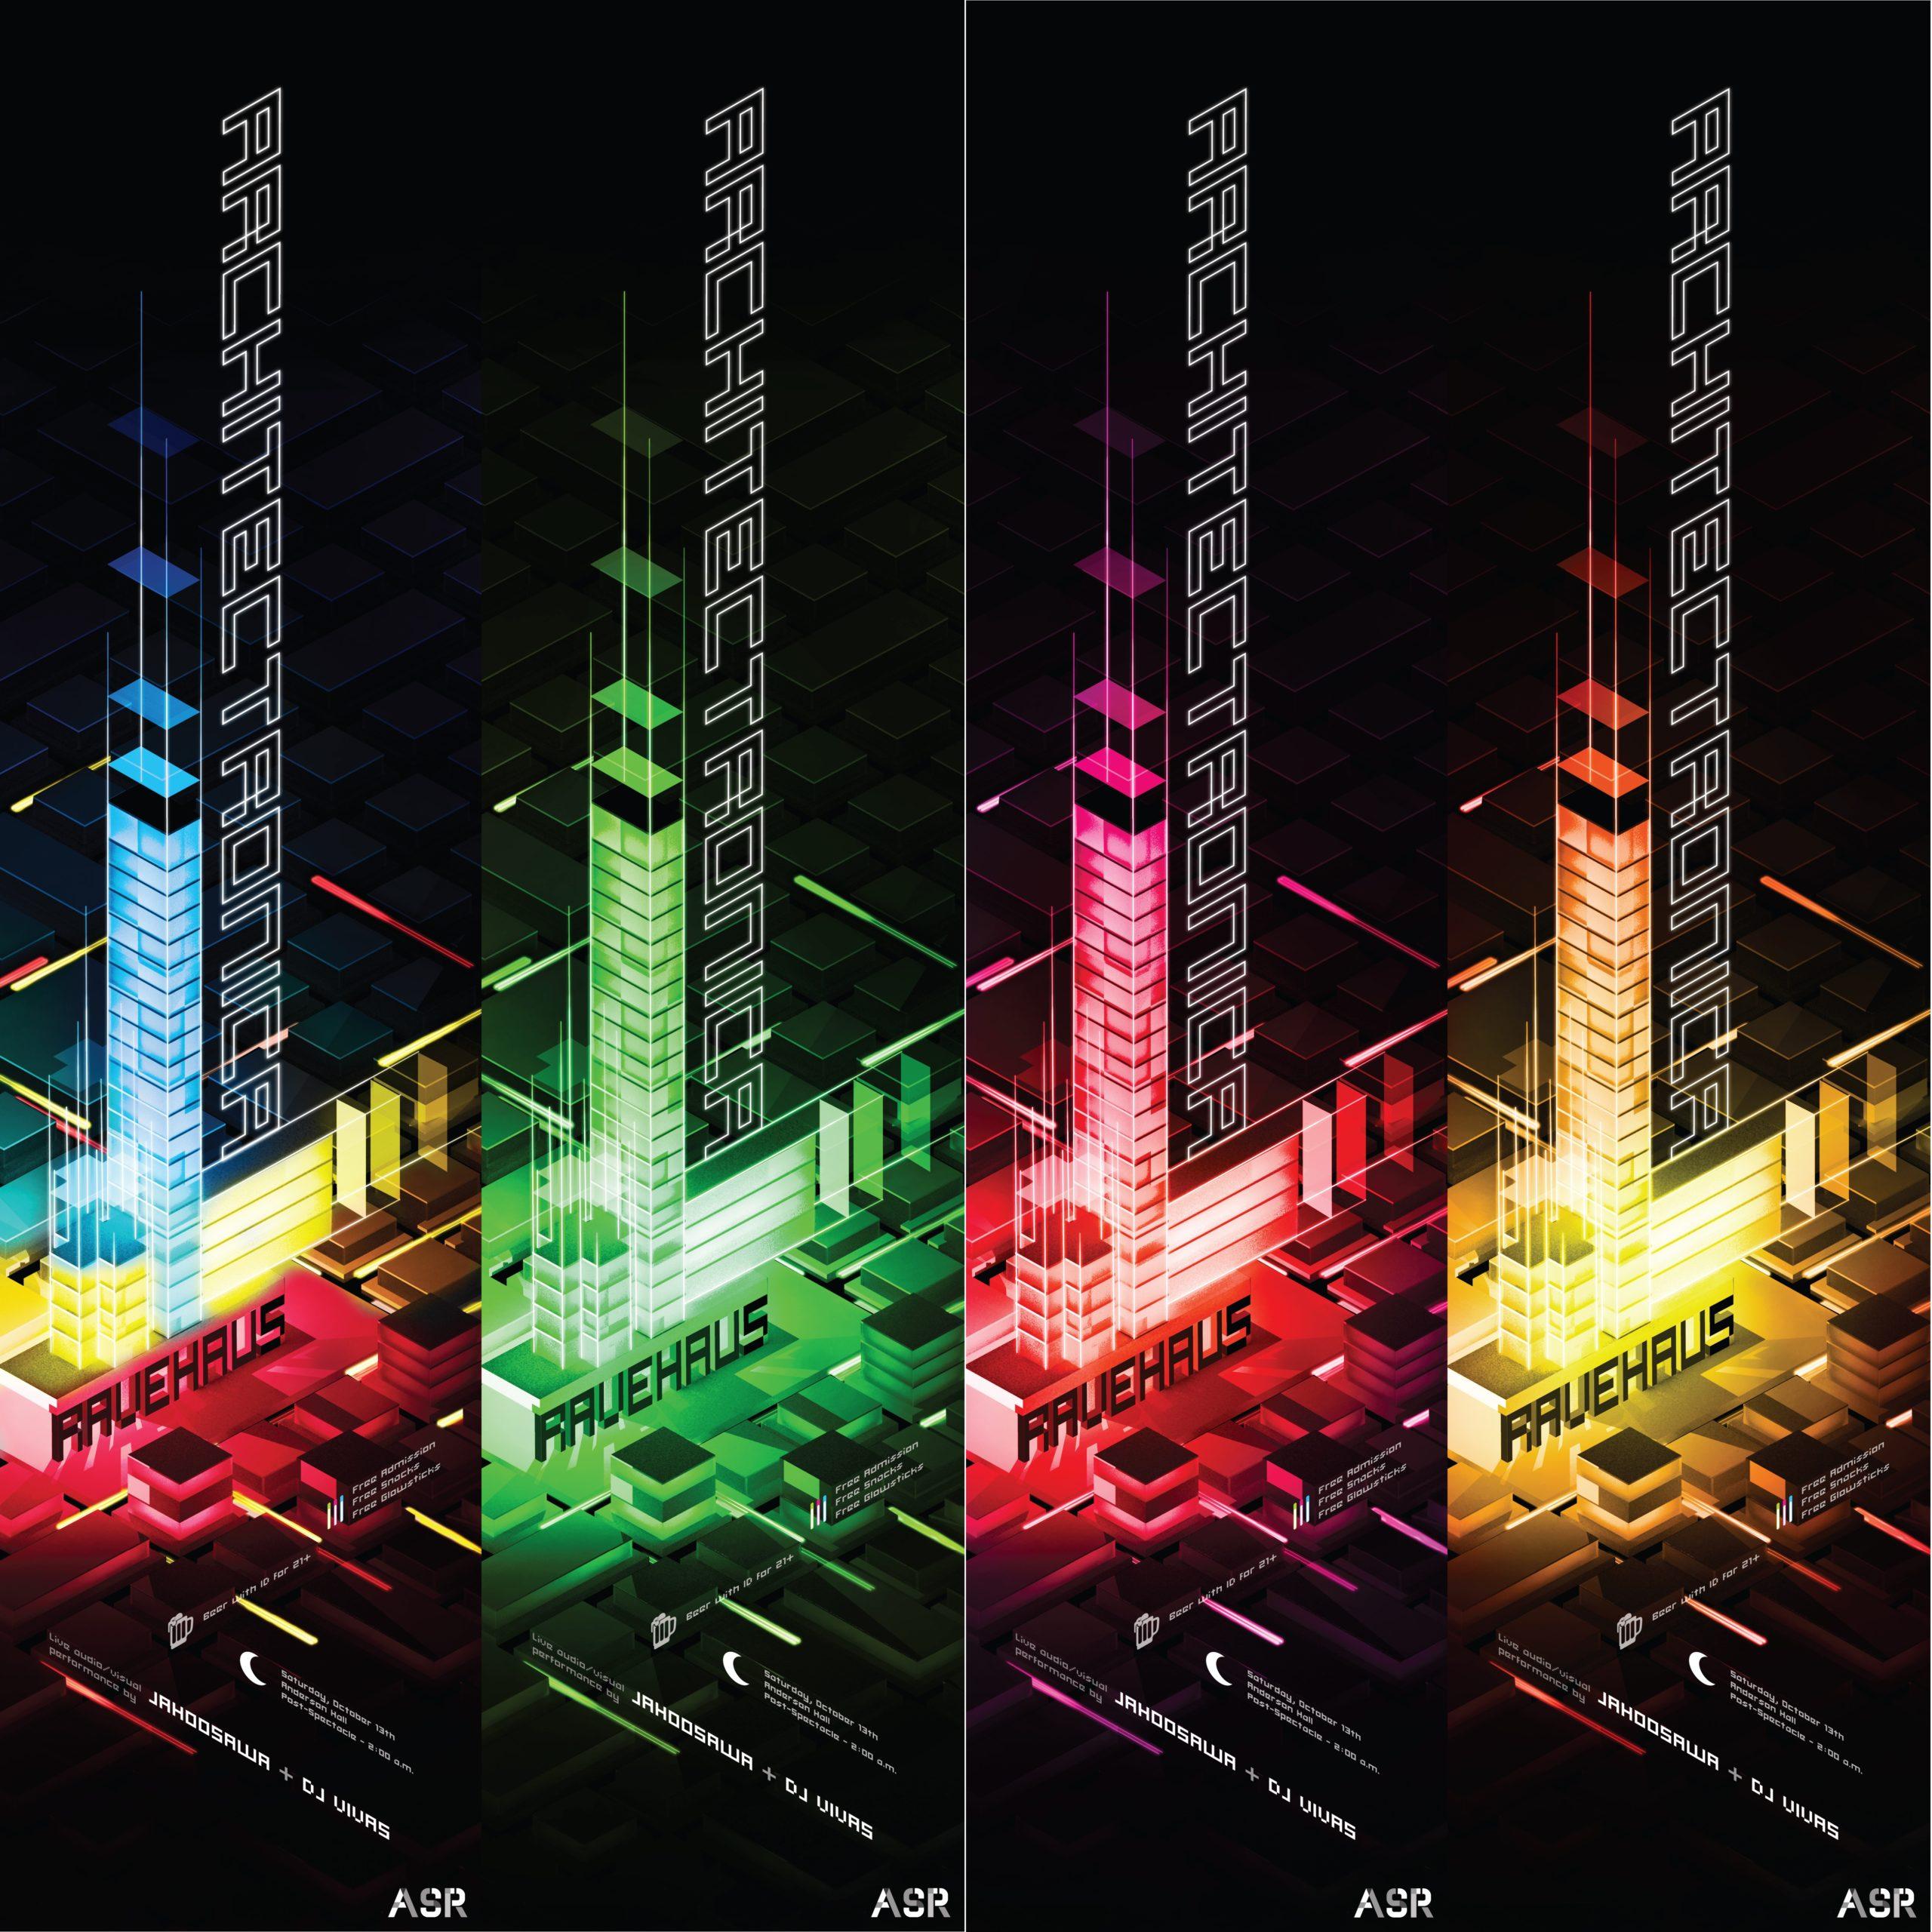 architectronica ravehau5 poster set